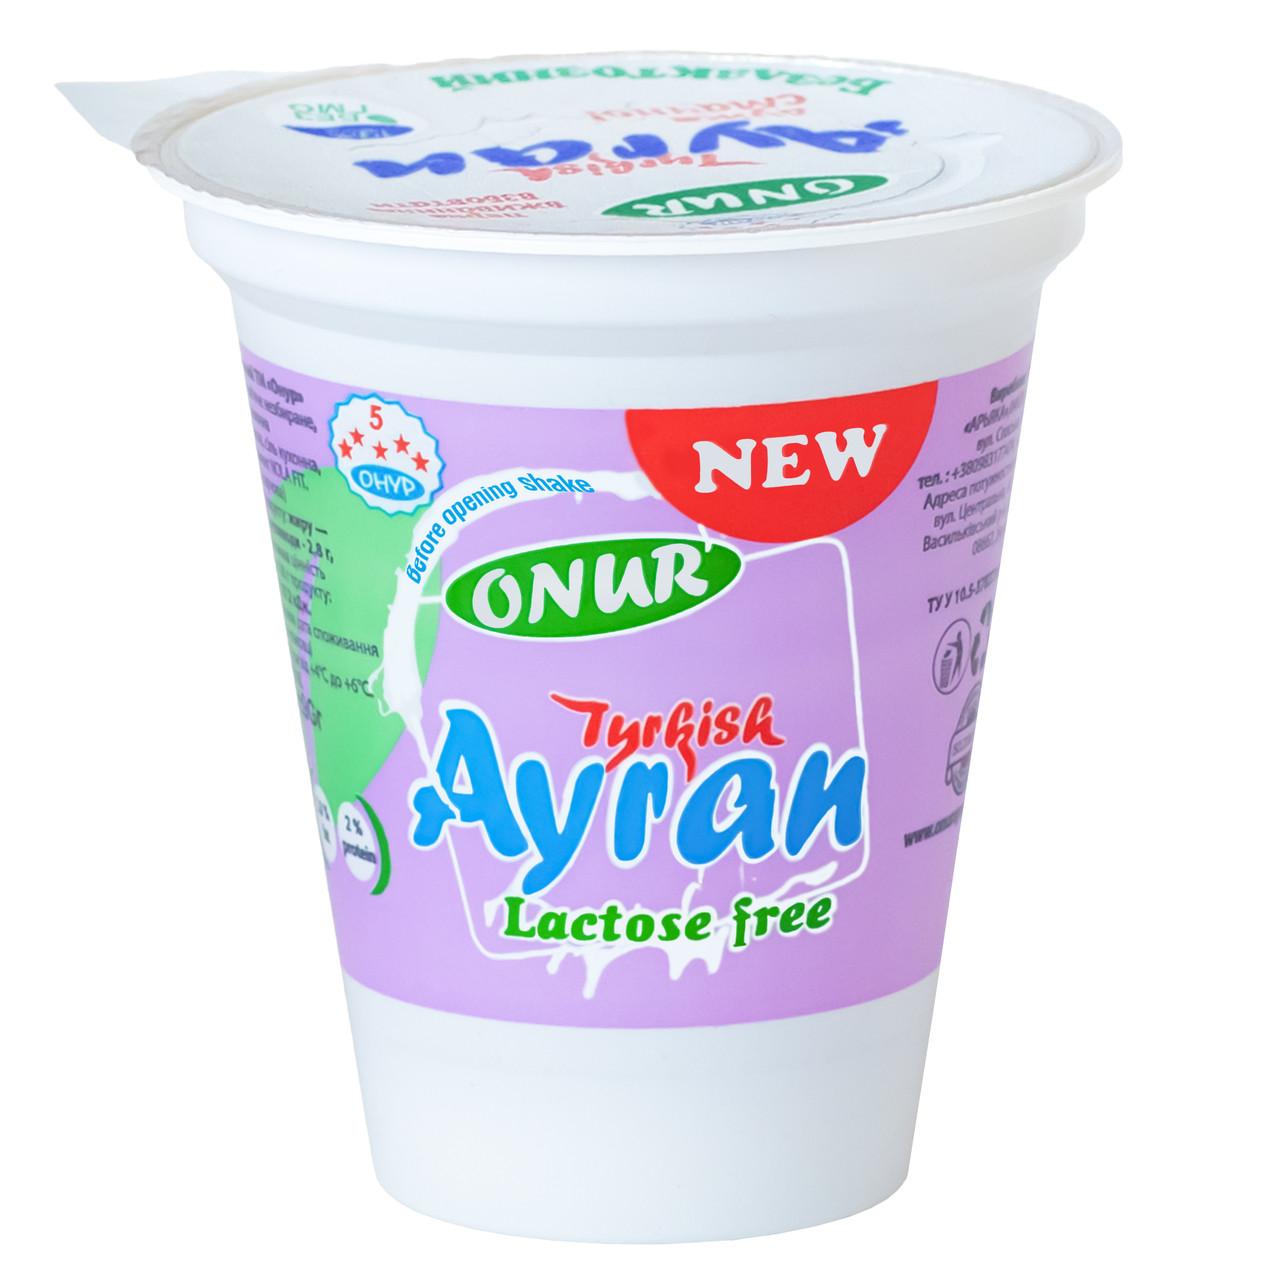 Айран безлактозный Турецкий, 0,3 л (Turkish Ayran Lactose free) TM ONUR